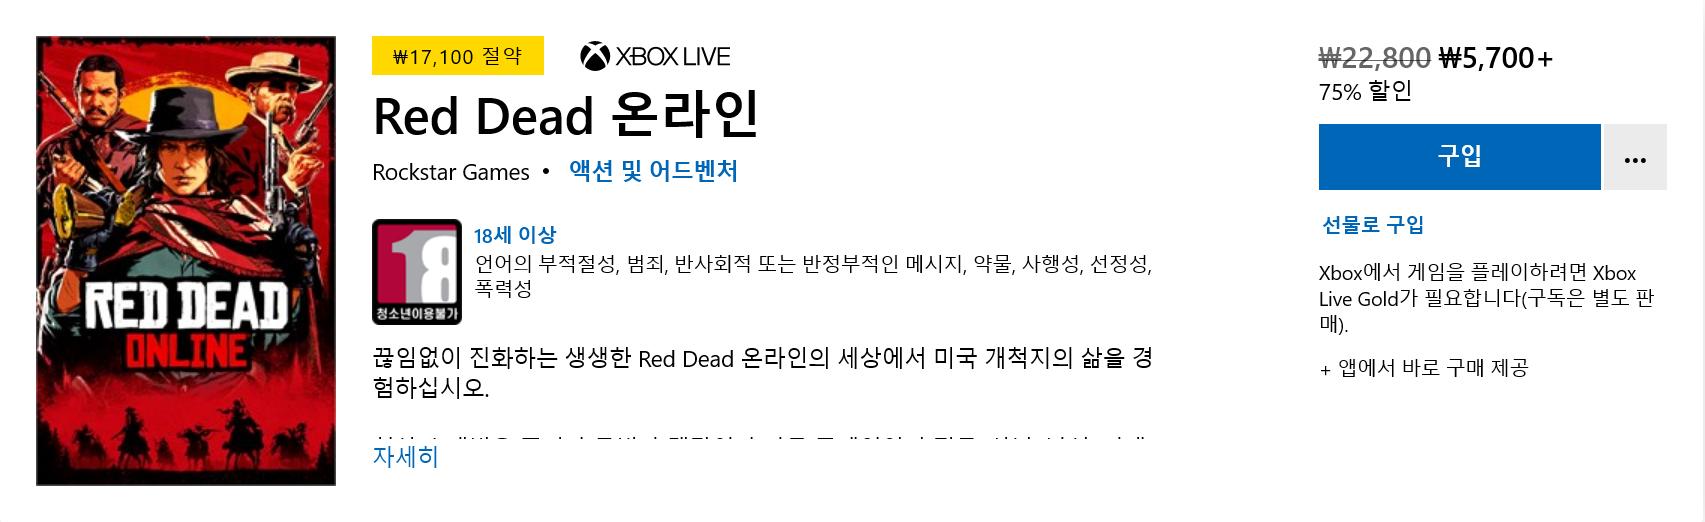 Screenshot_2020-12-02 Red Dead 온라인 구매 - Microsoft Store ko-KR.png